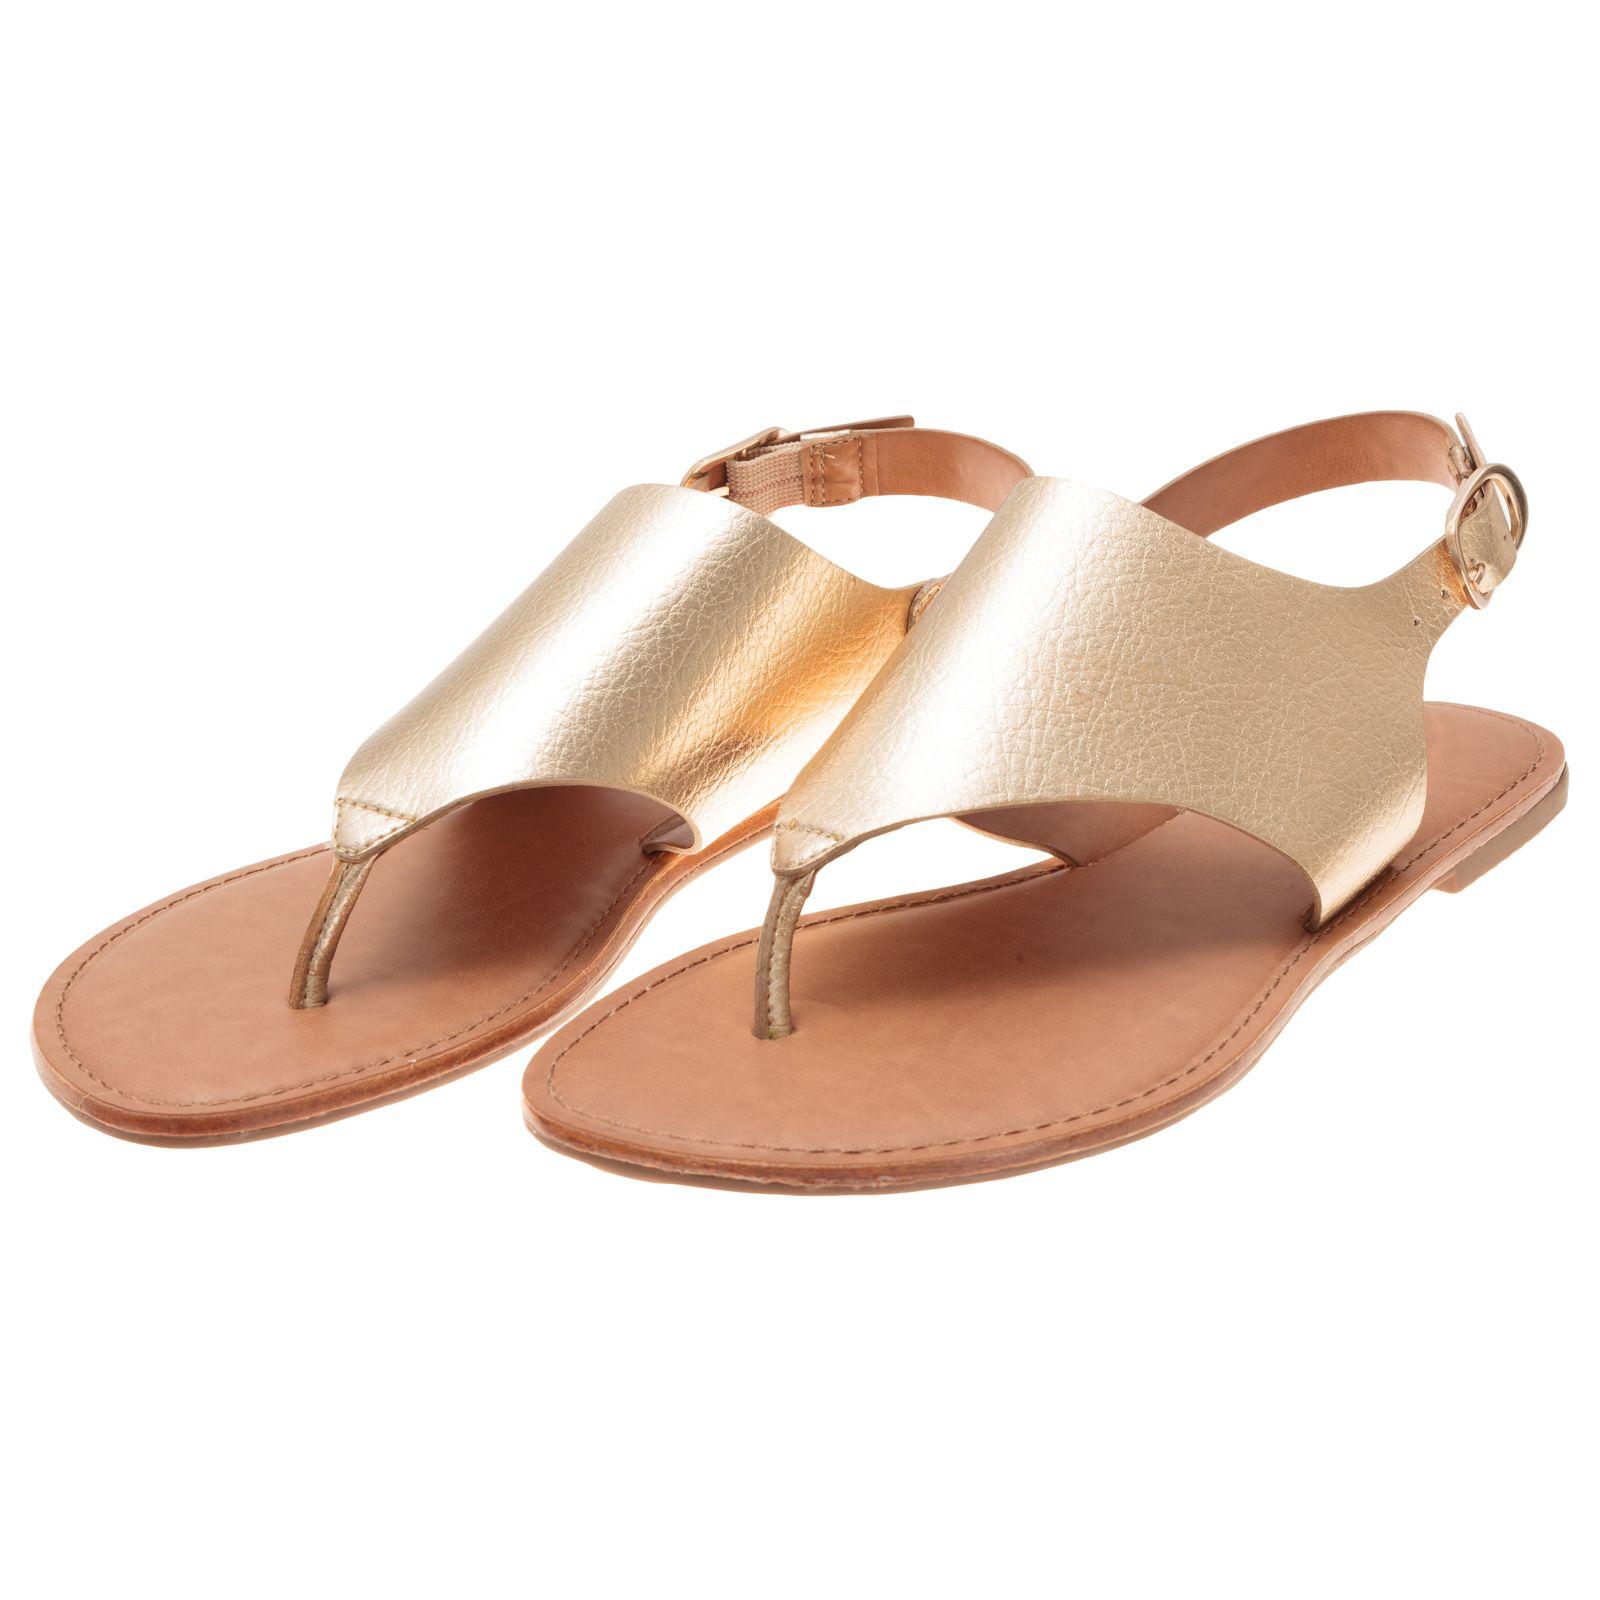 Anacapri Flat Shoes